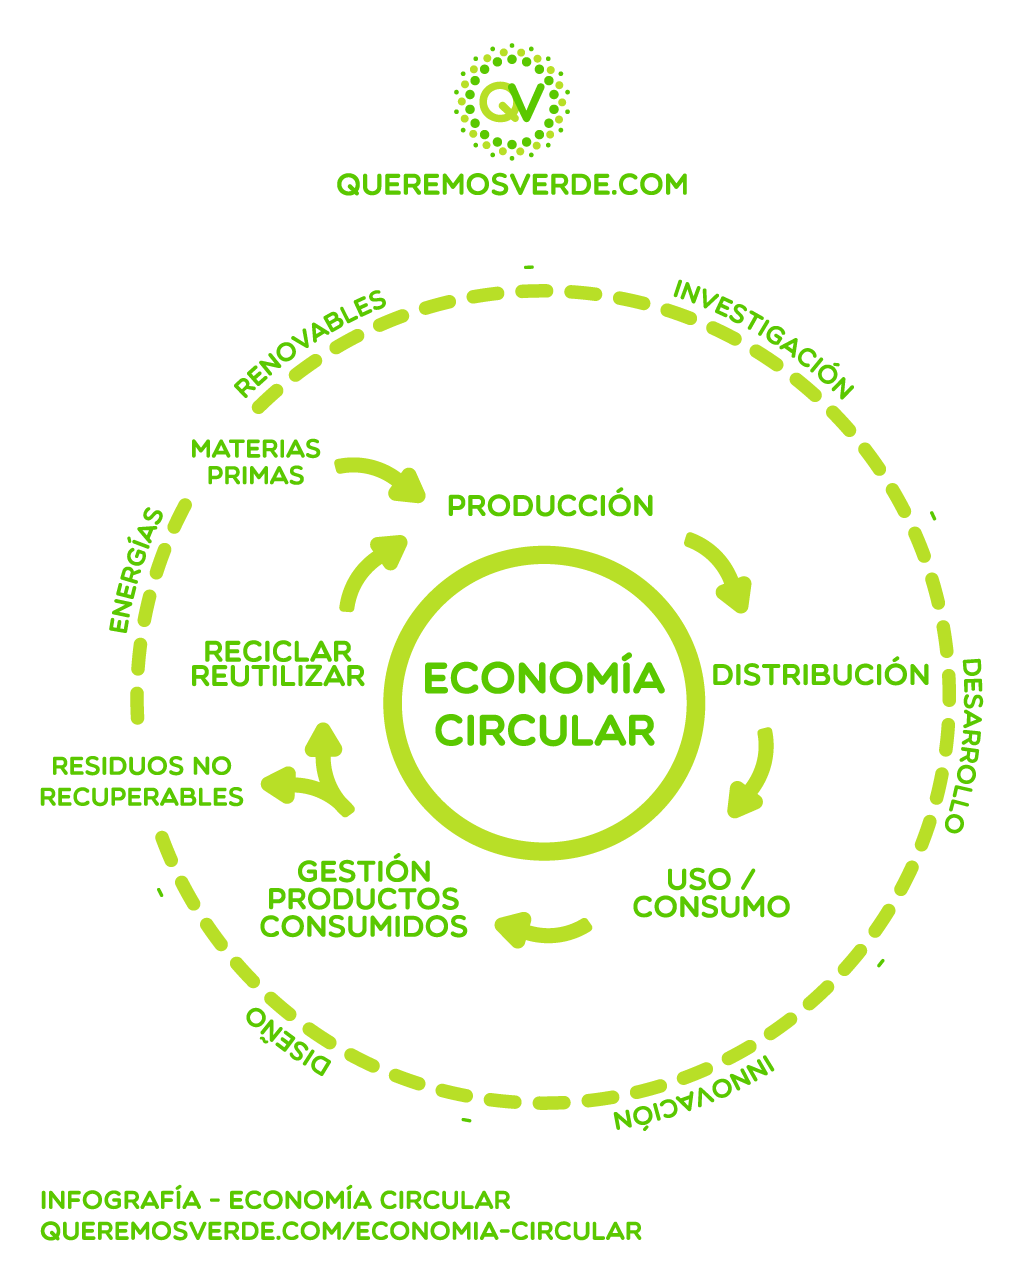 queremos-verde-economia-circular-infografia